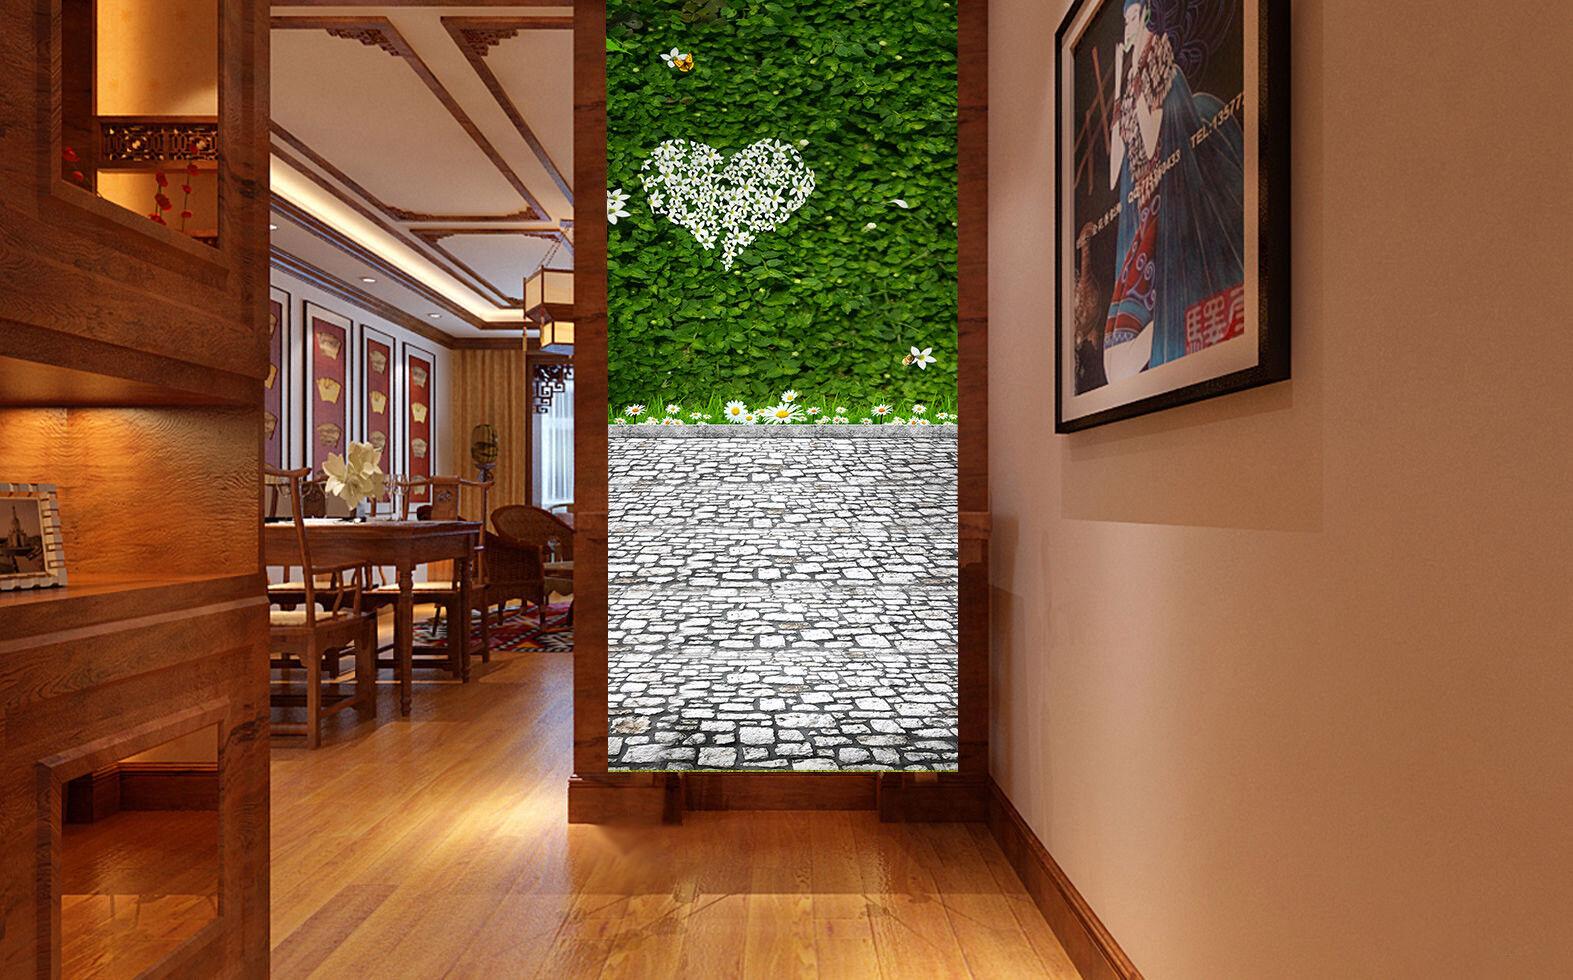 3D grau Stone Stone Stone Grün Vine 45 Wall Paper Wall Print Decal Wall Deco Indoor Mural 12785f